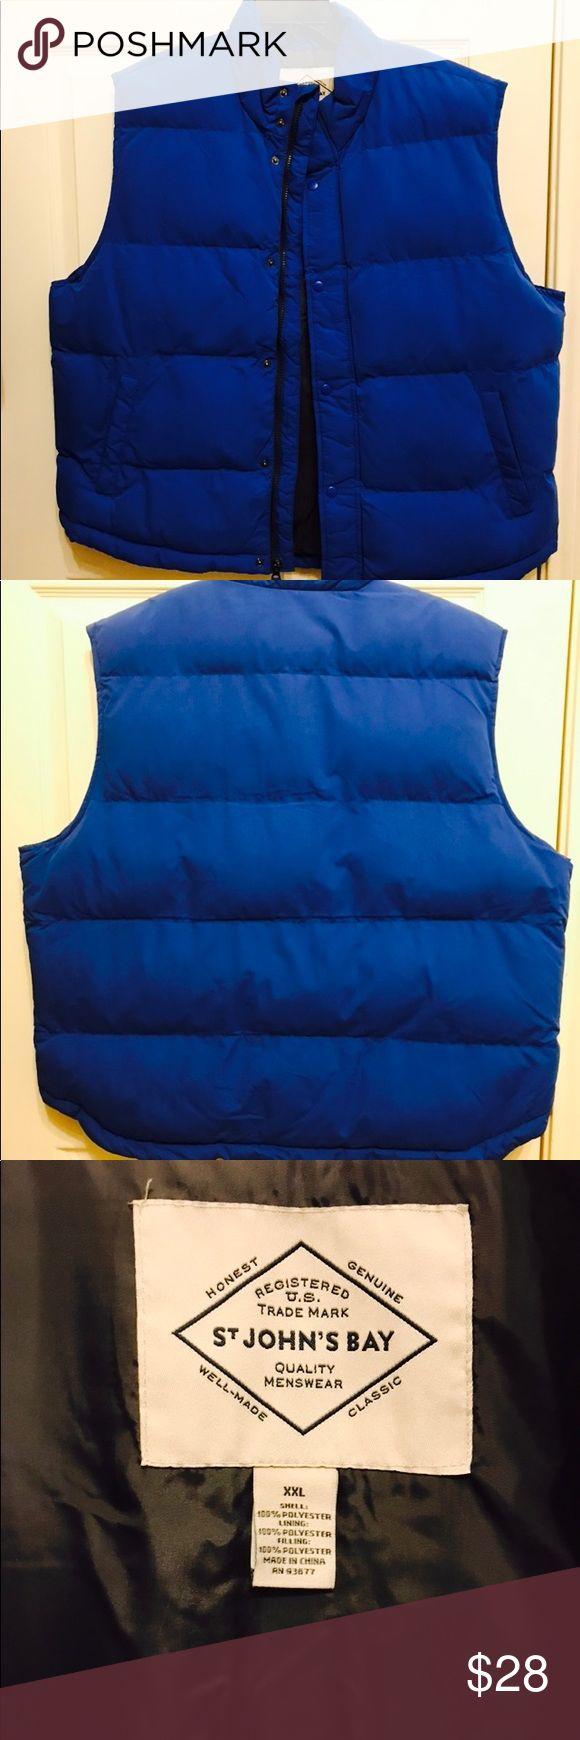 Men's Puffer Vest - St. John's Bay NWOT | Men's Puffer Vest - St. John's Bay | Excellent Condition, never worn. St. John's Bay Jackets & Coats Vests